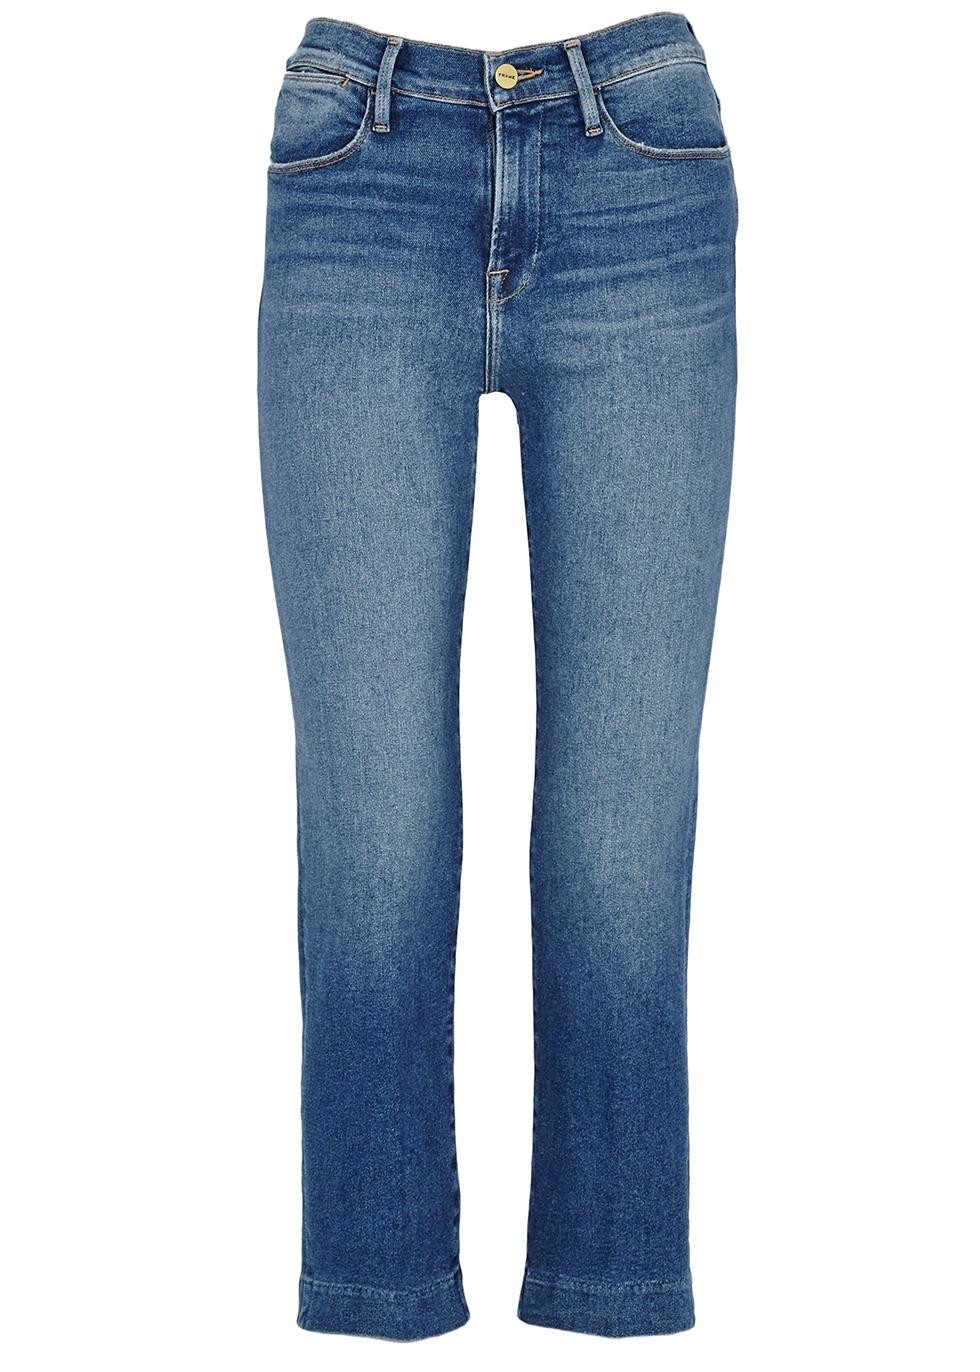 002c533e1ad8 Women s Designer Denim Jeans - Harvey Nichols